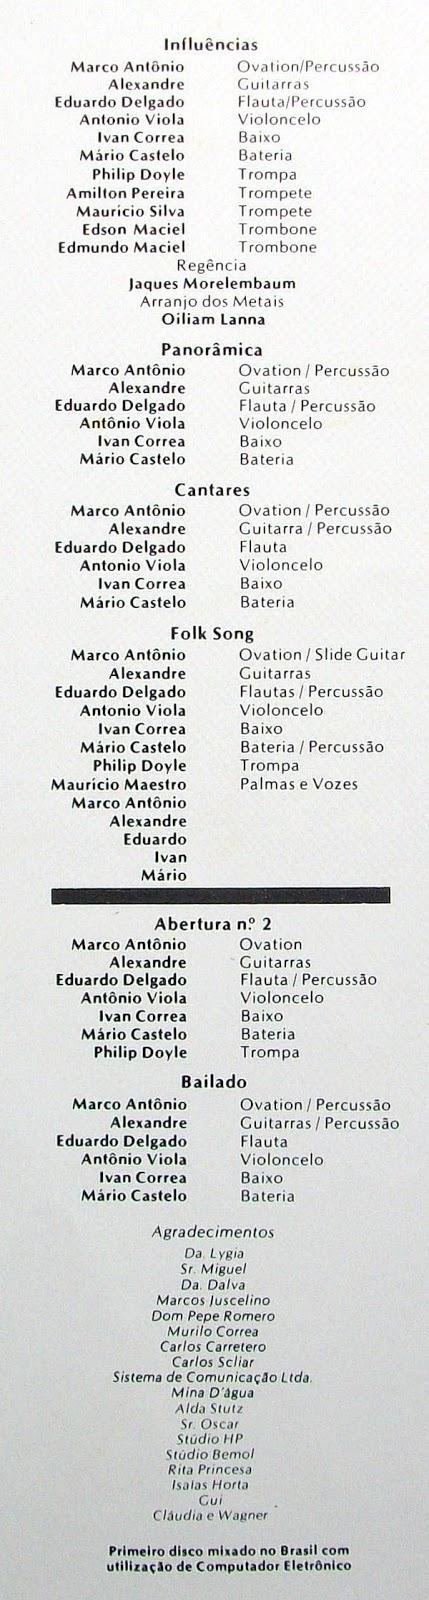 "johnkatsmc5: Marco Antônio Araújo ""Influências"" 1981 Brazil Prog ..."